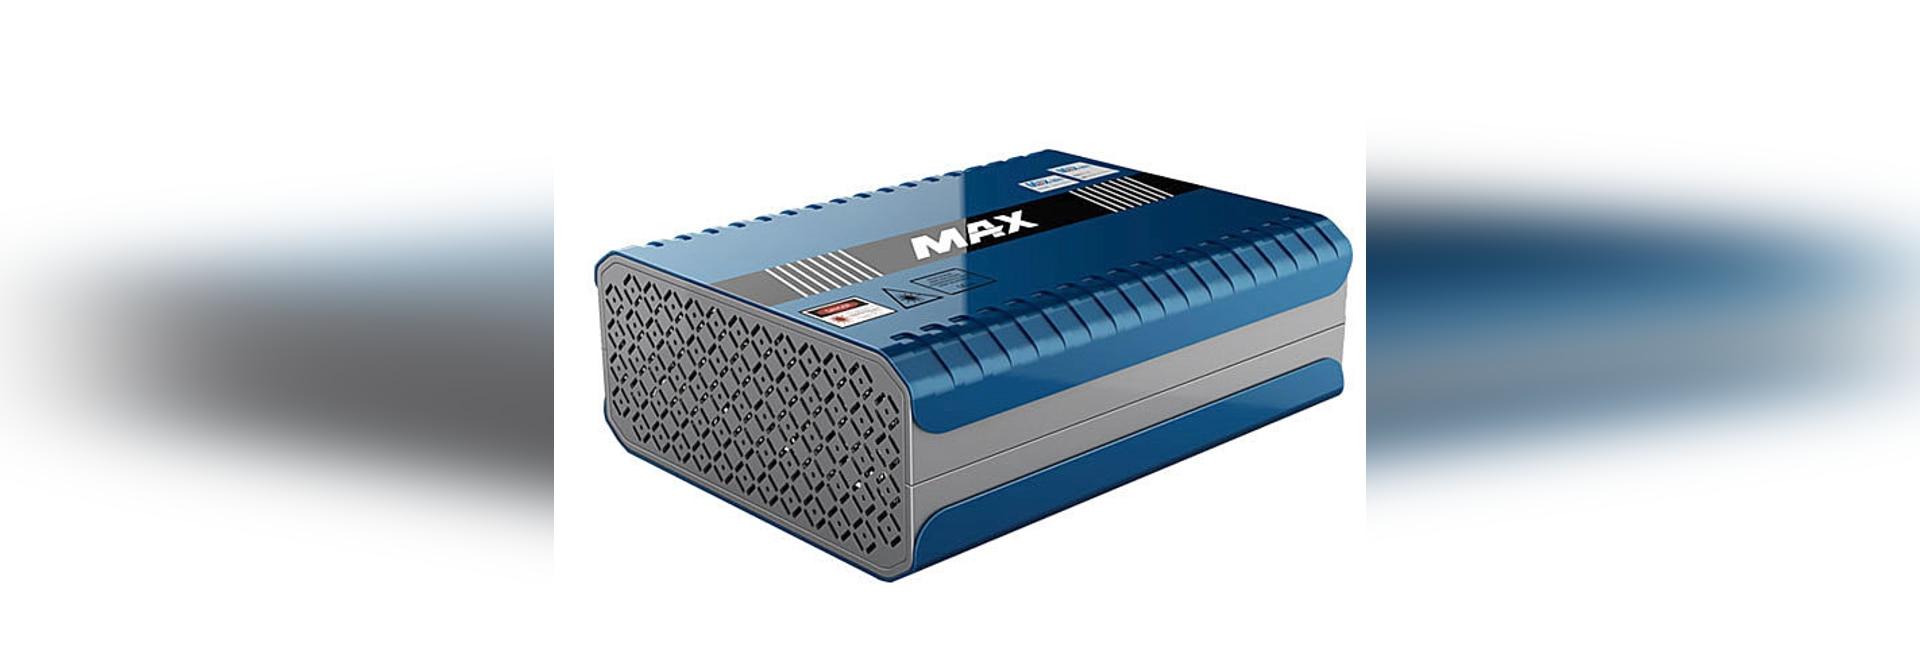 Black Marking on Alumina--MOPA Fiber Laser Source from Maxphotonics